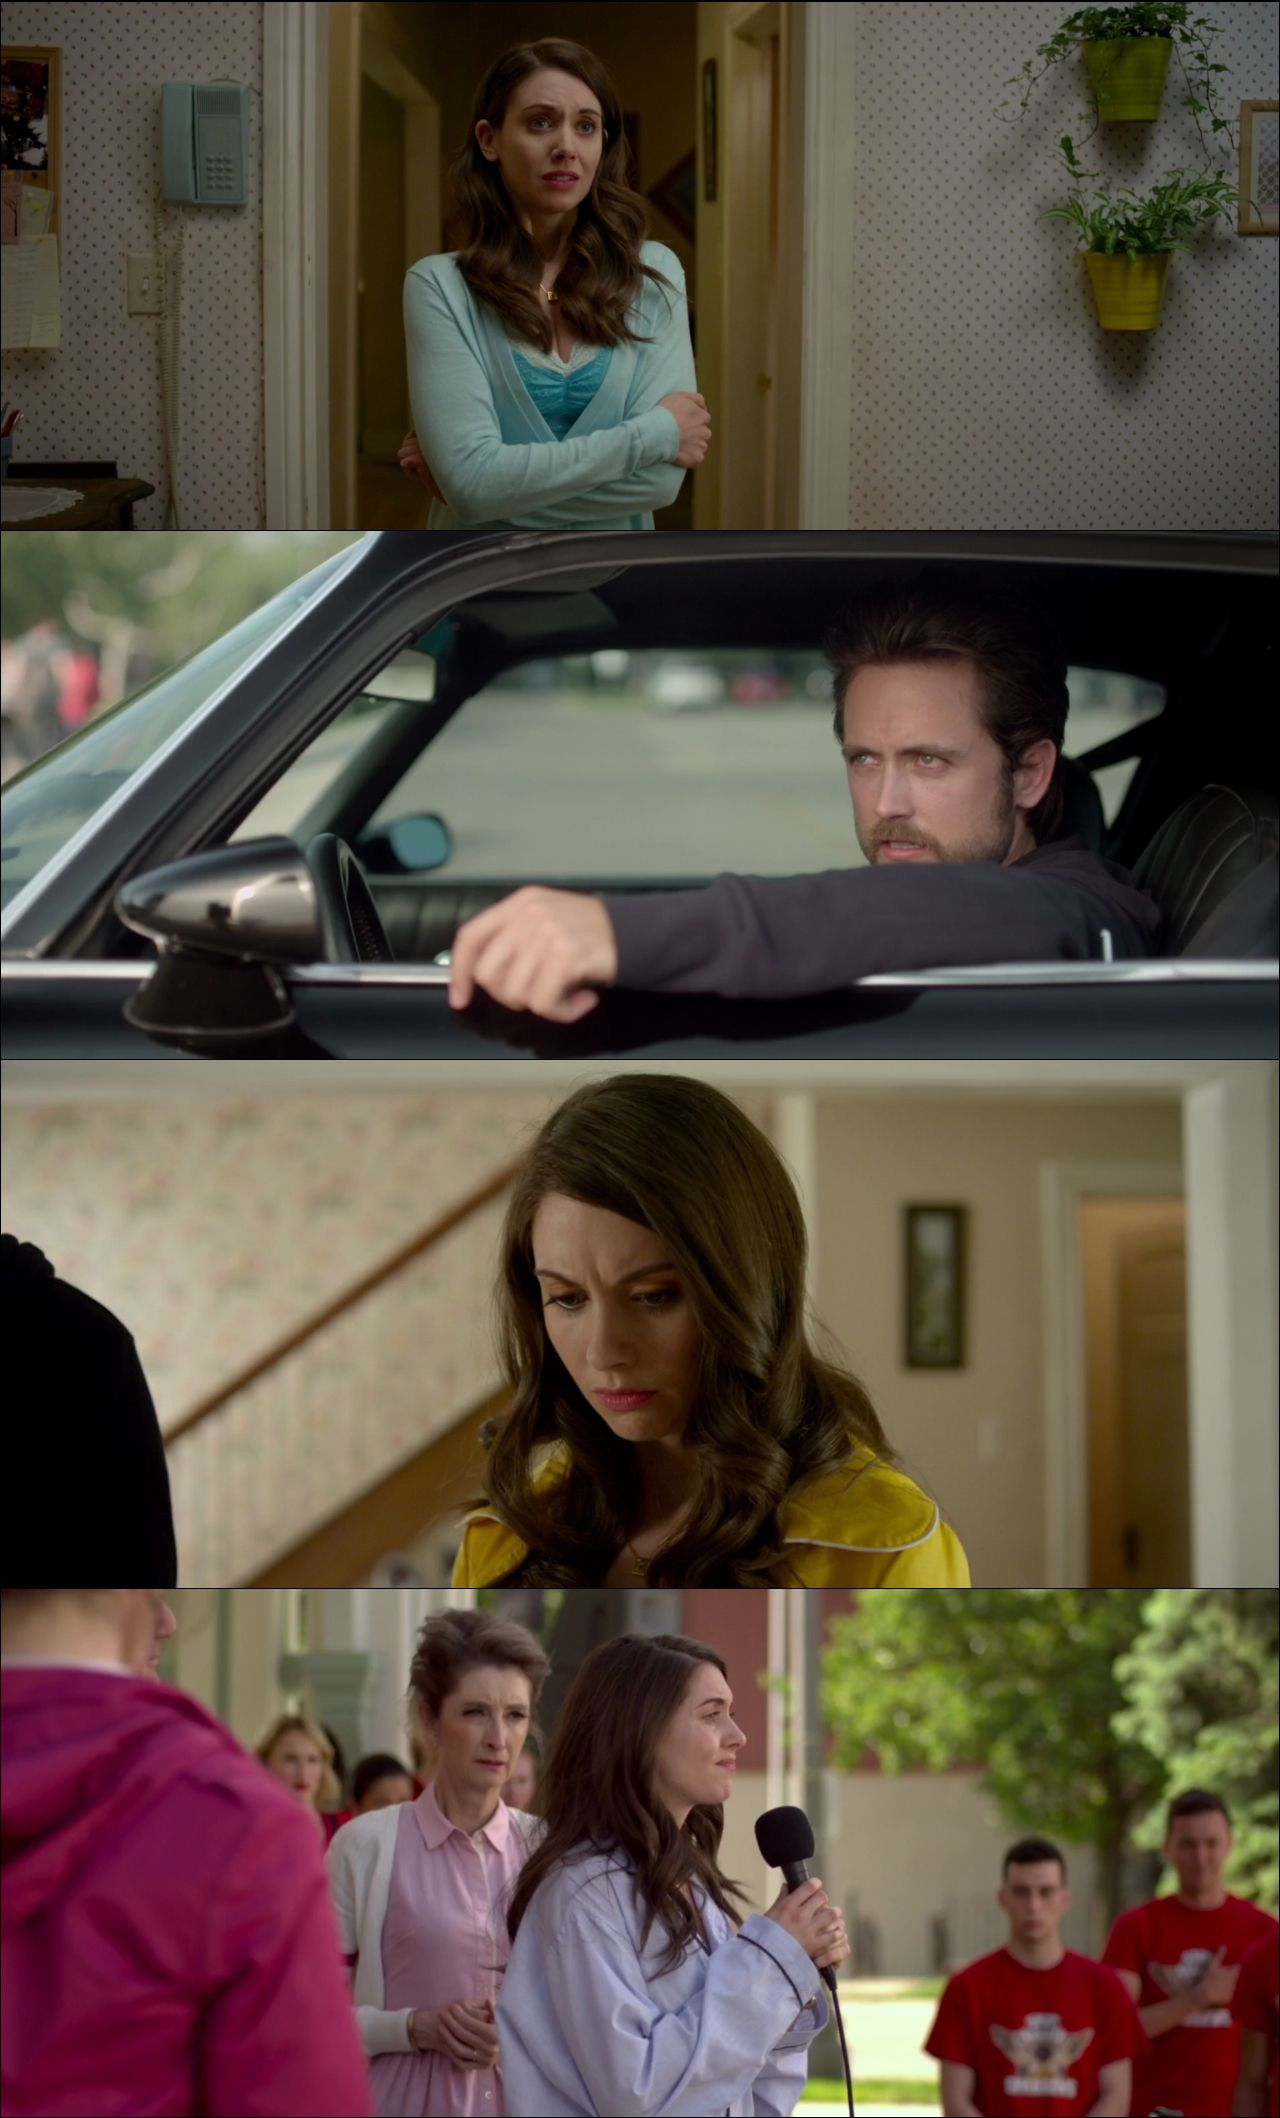 Bir Garip Aşk - No Stranger Than Love (2015) türkçe dublaj film indir